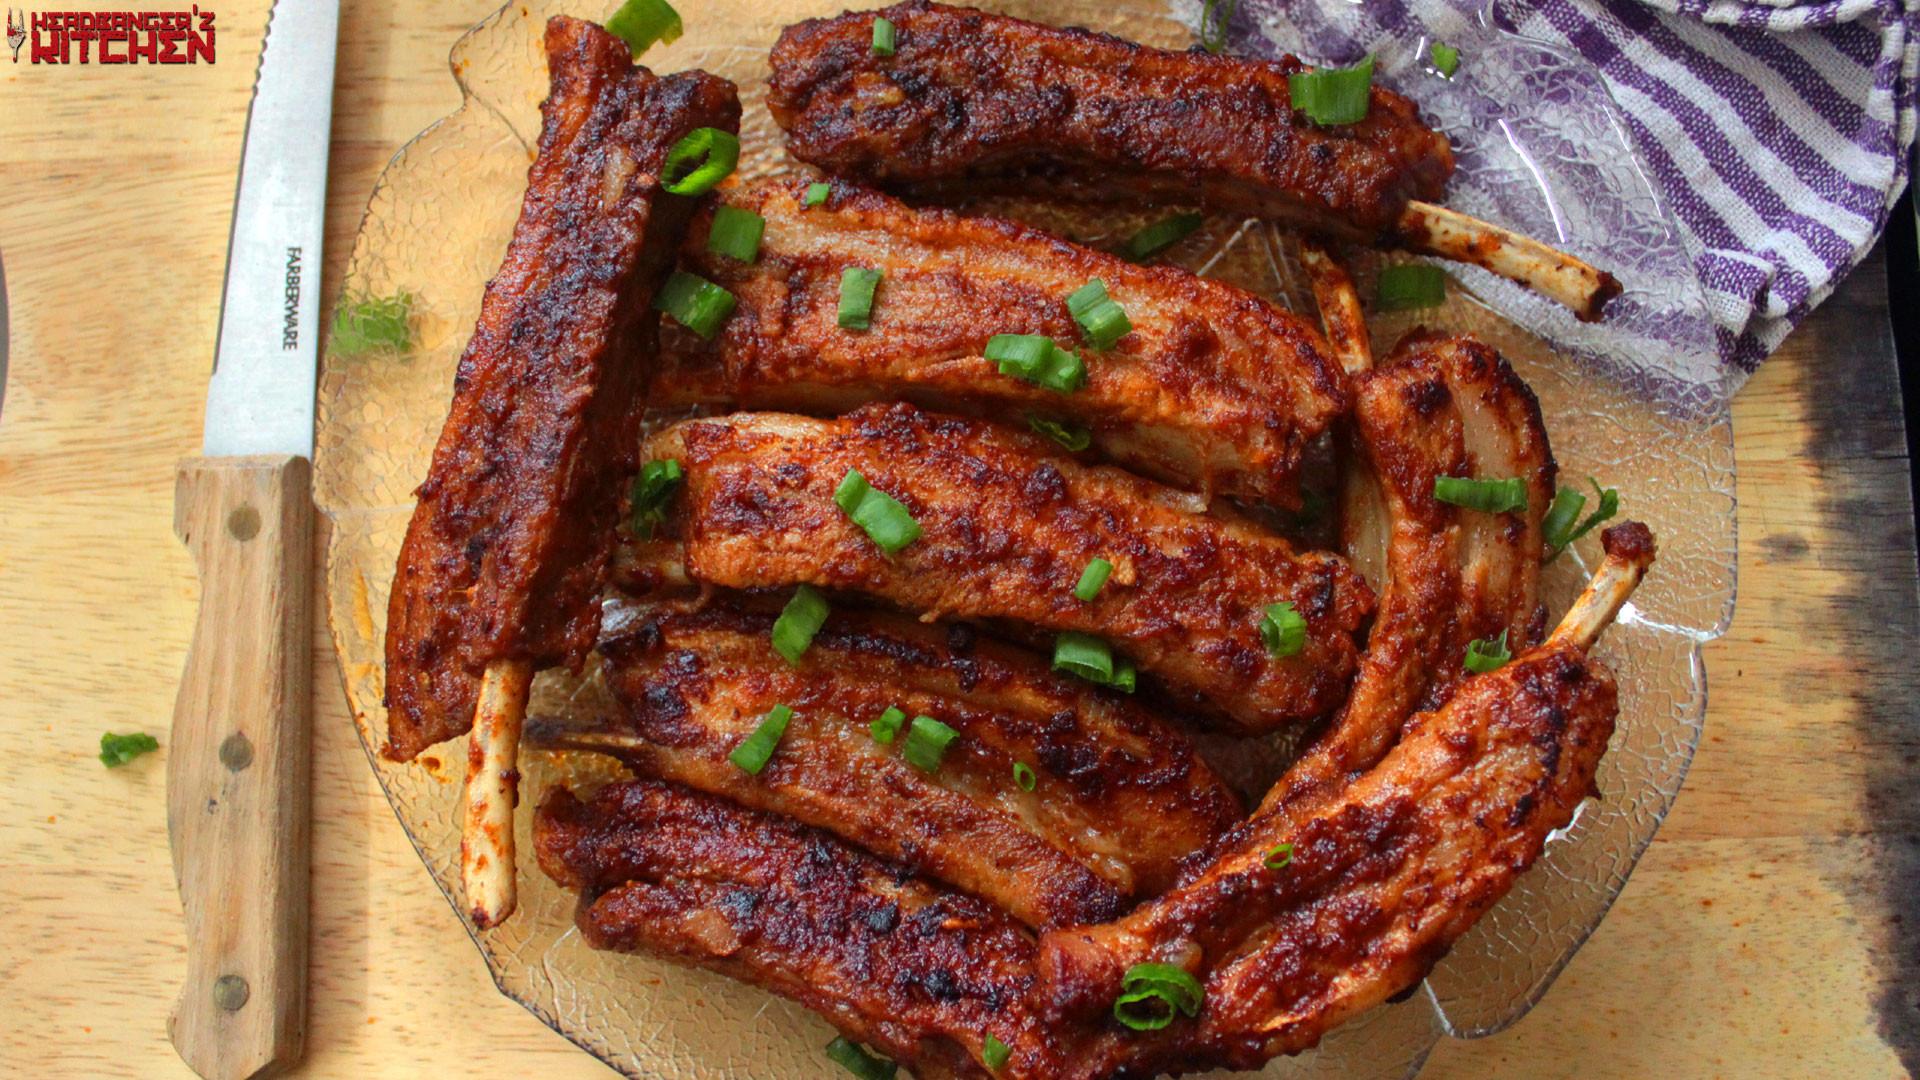 Bbq Pork Spare Ribs  Keto BBQ Pork Spare Ribs Headbanger s Kitchen Keto All